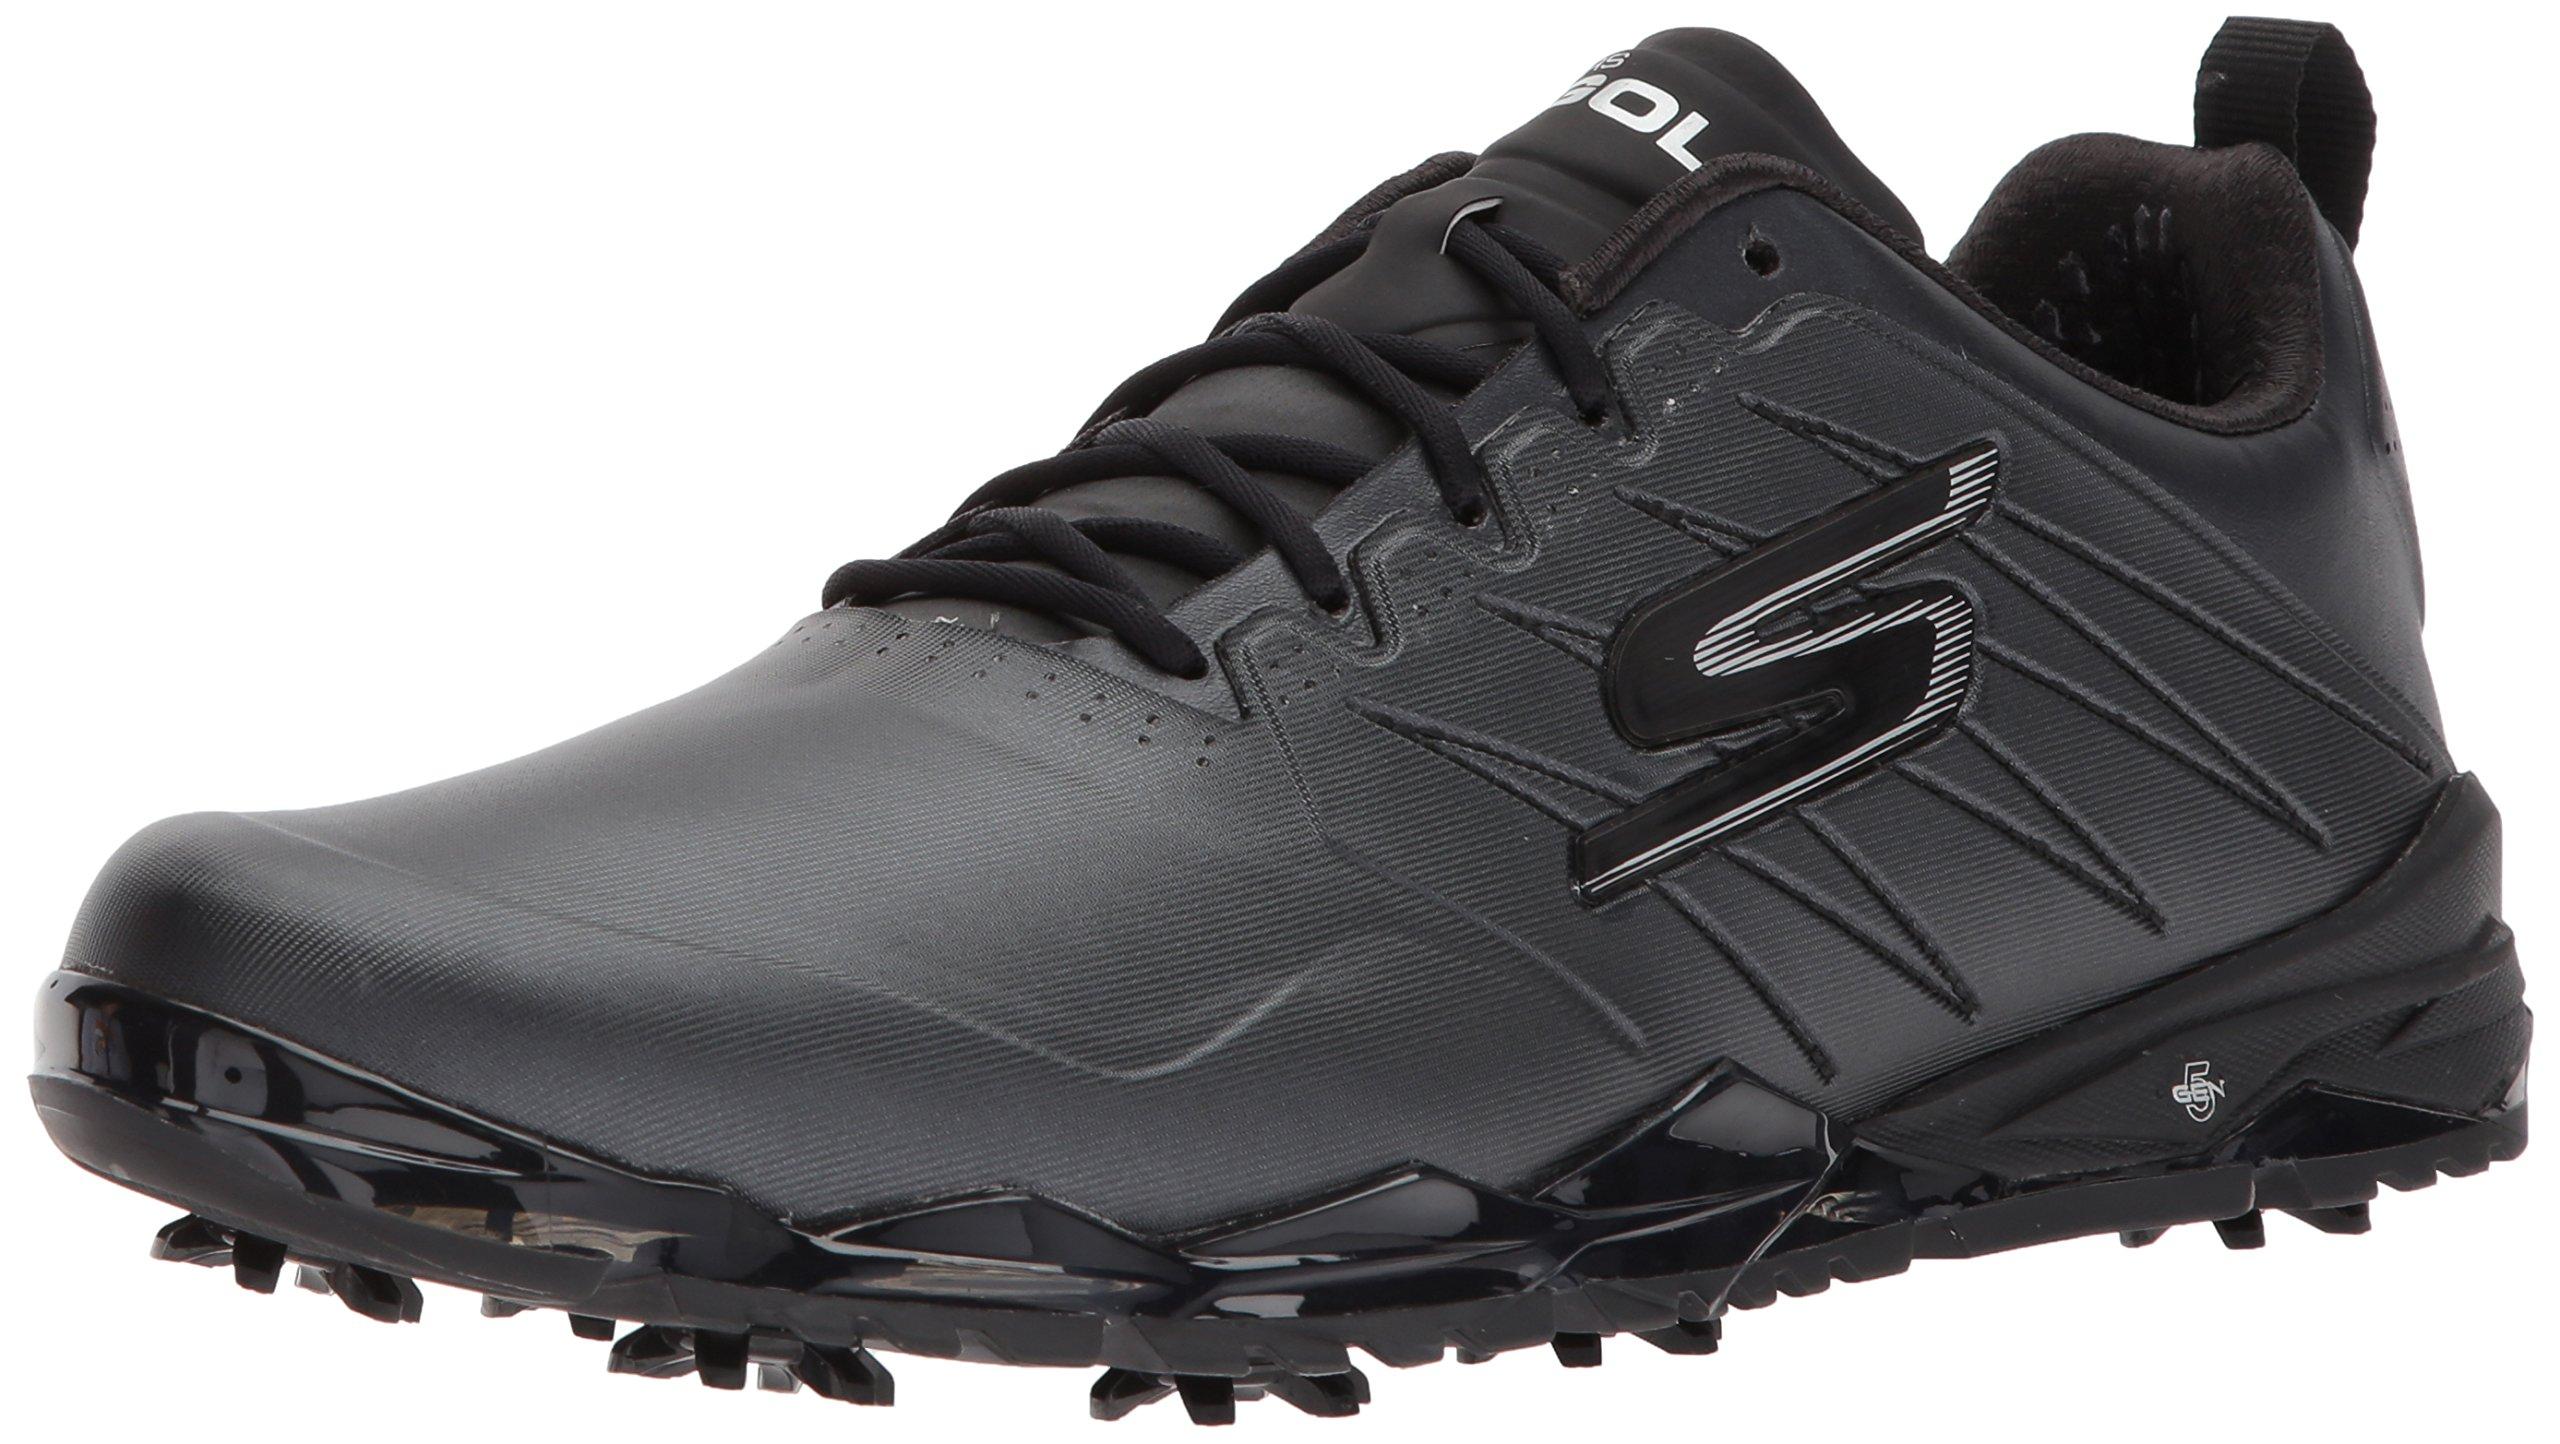 Skechers Performance Men's Go Golf Focus 2 Golf Shoe,Black,12 M US